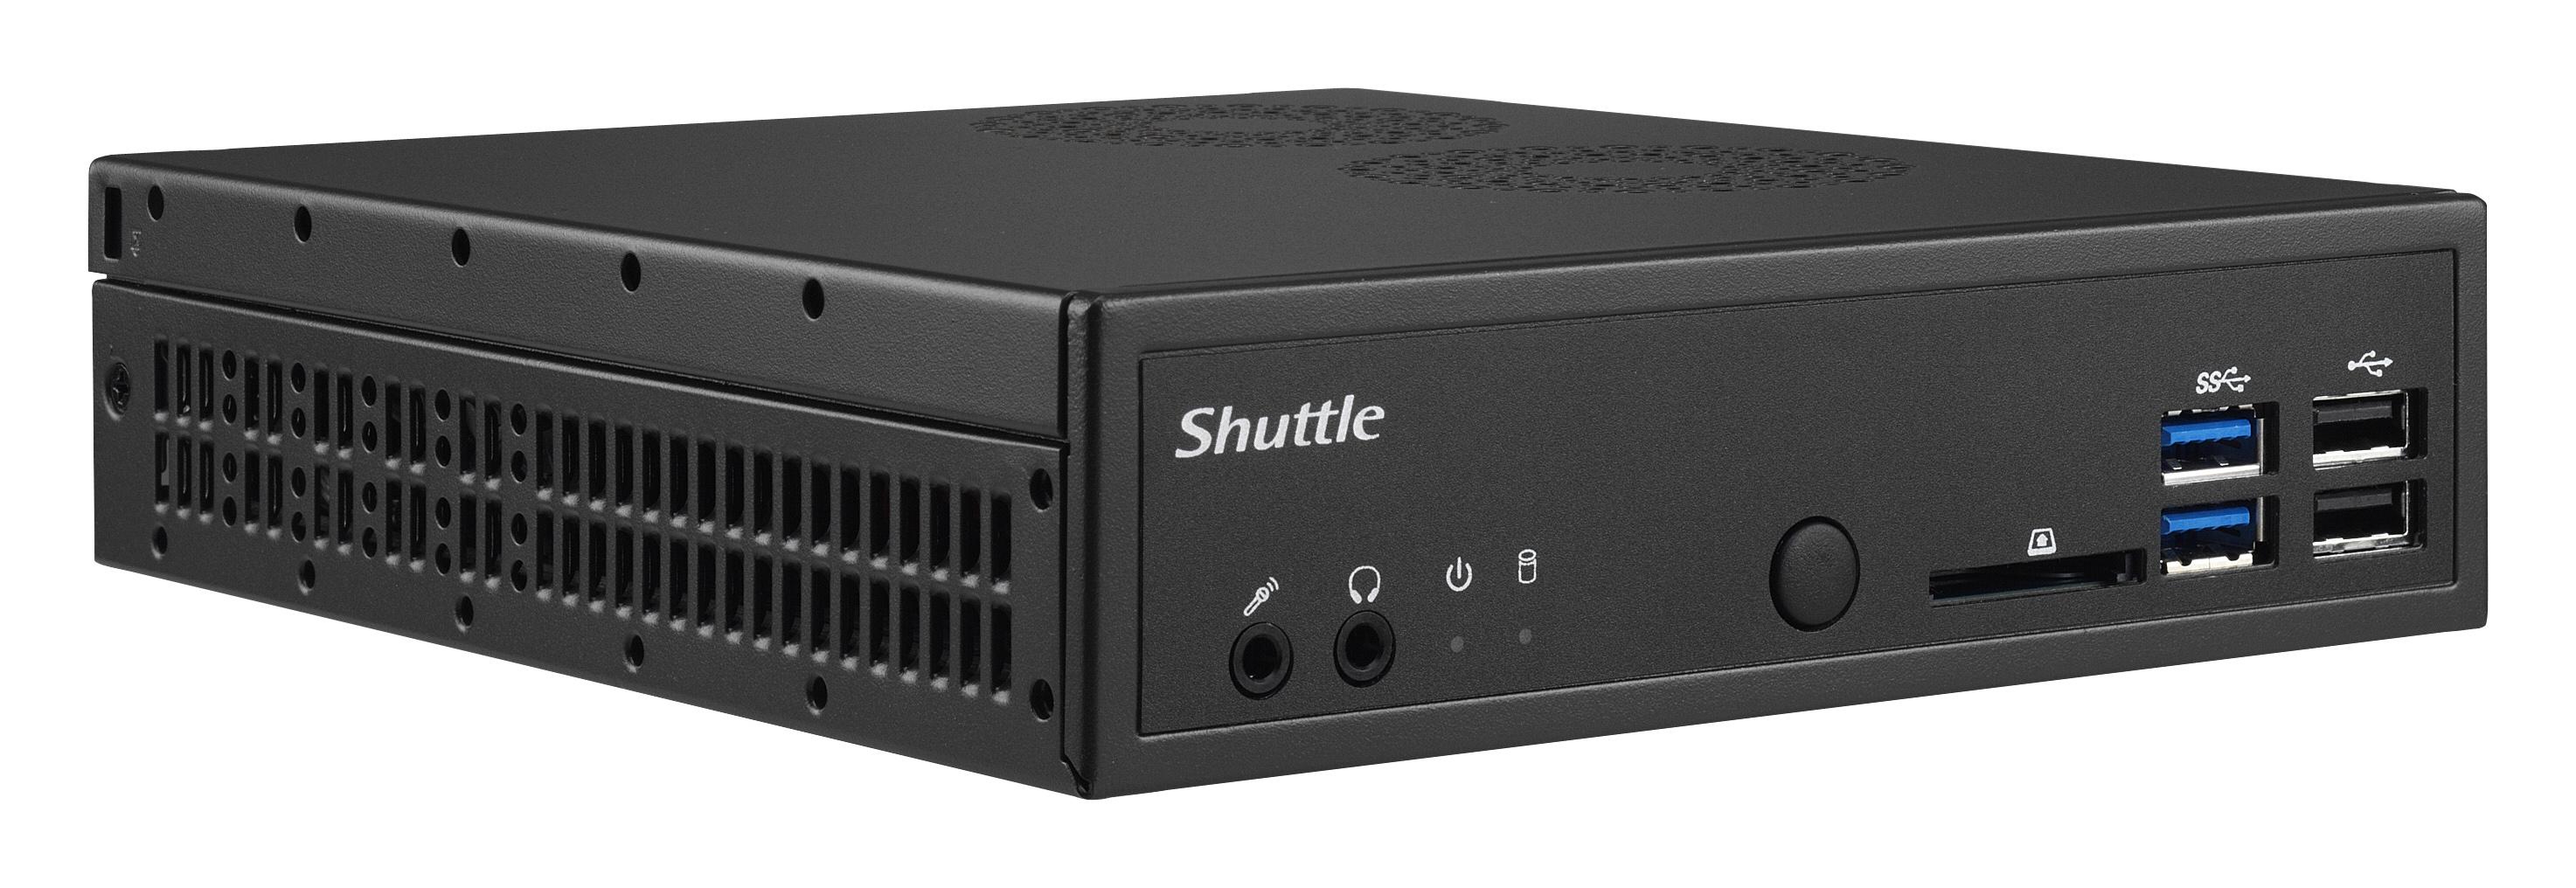 Shuttle XPC slim DH170 - Barebone - Slim-PC